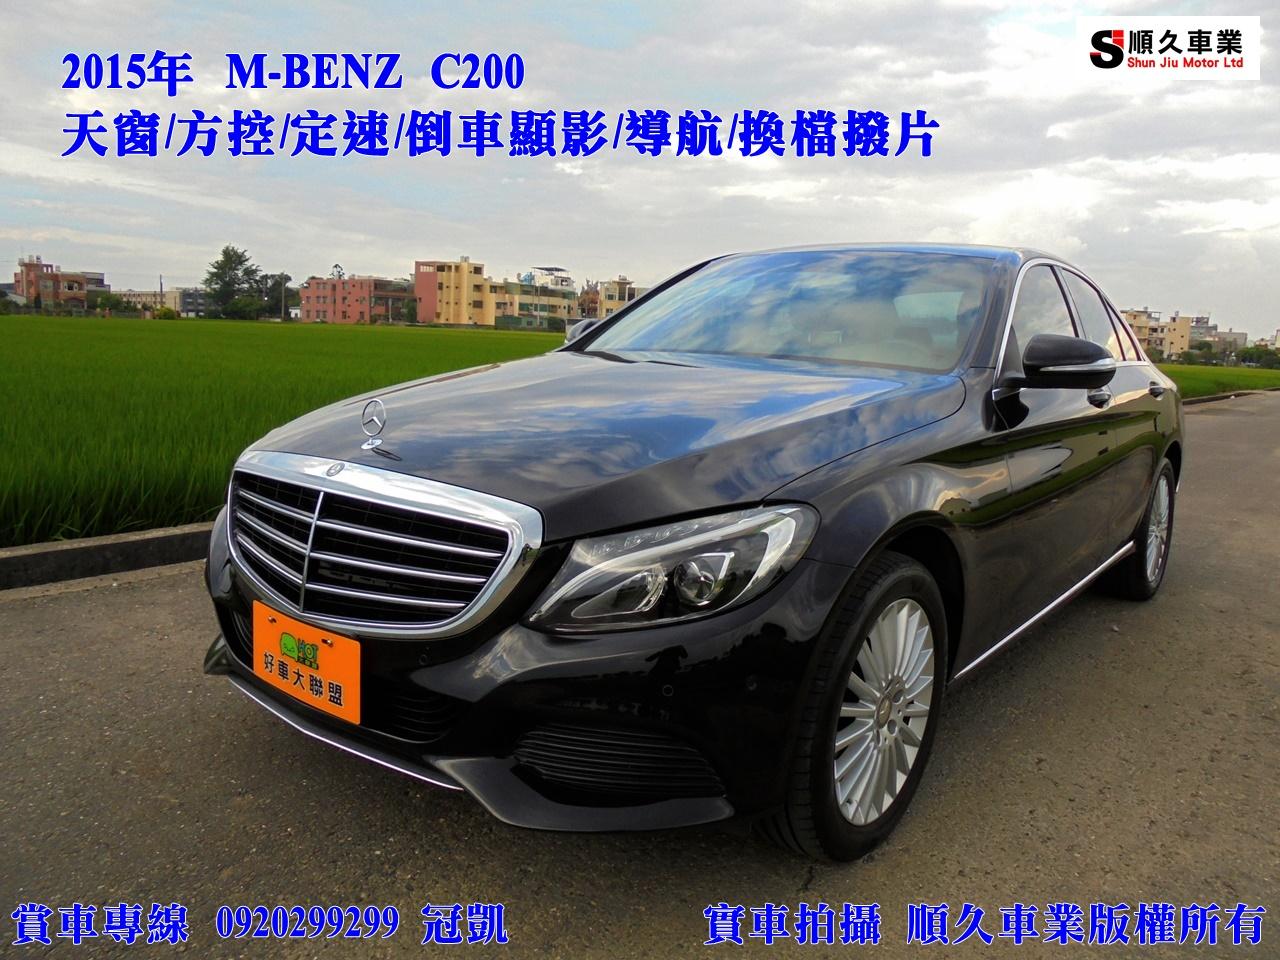 2015 M-benz C-class